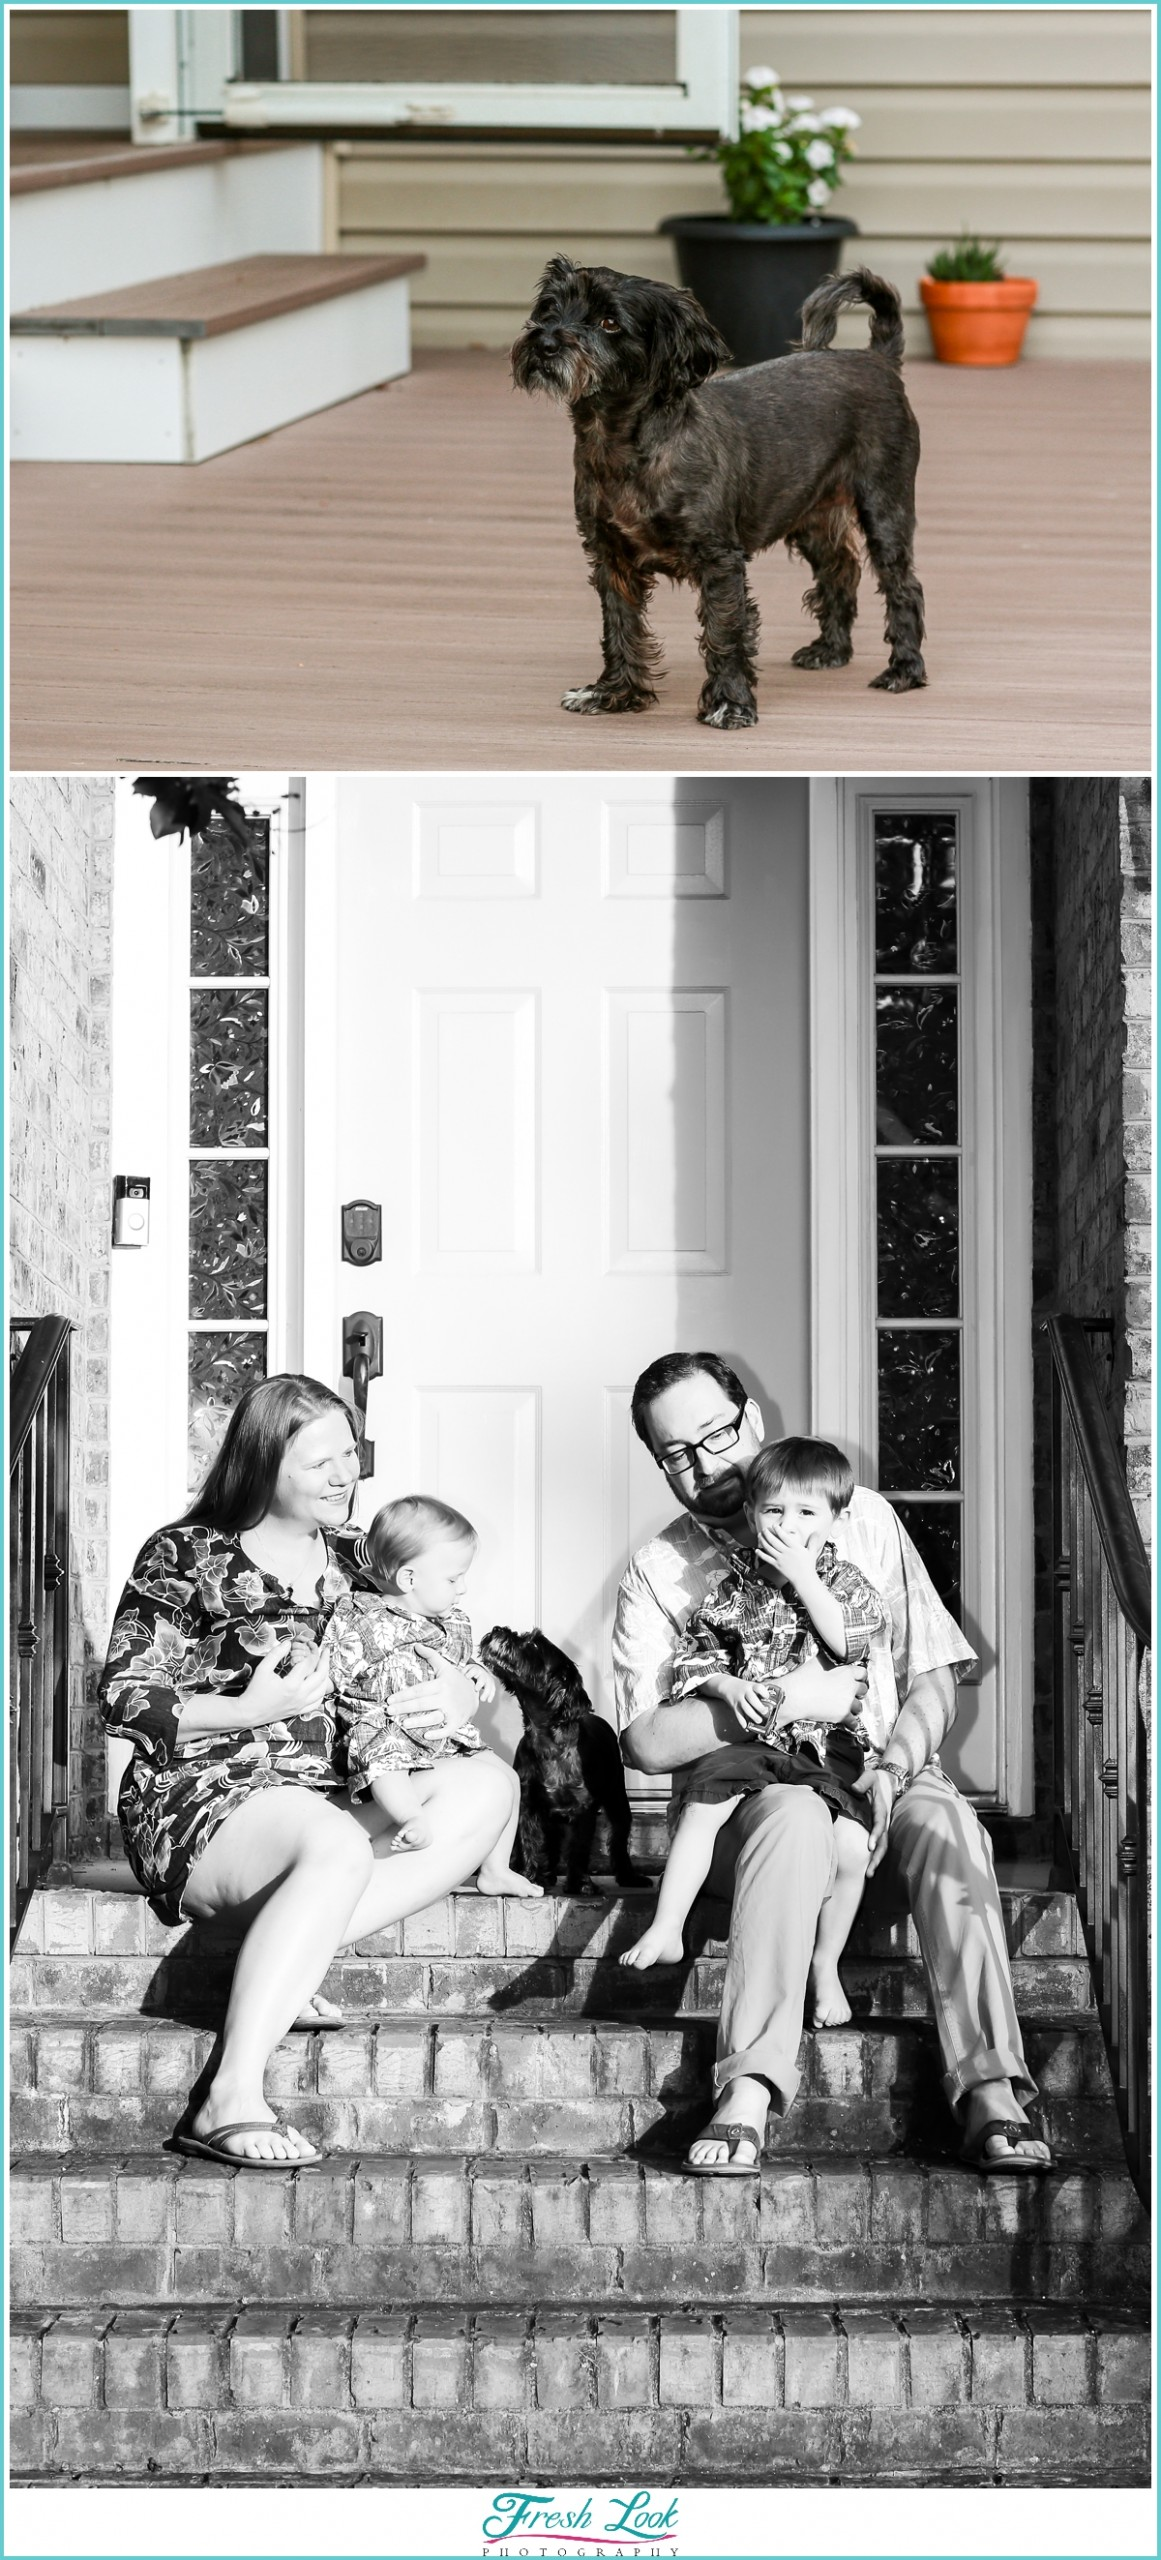 socially distant family photoshoot